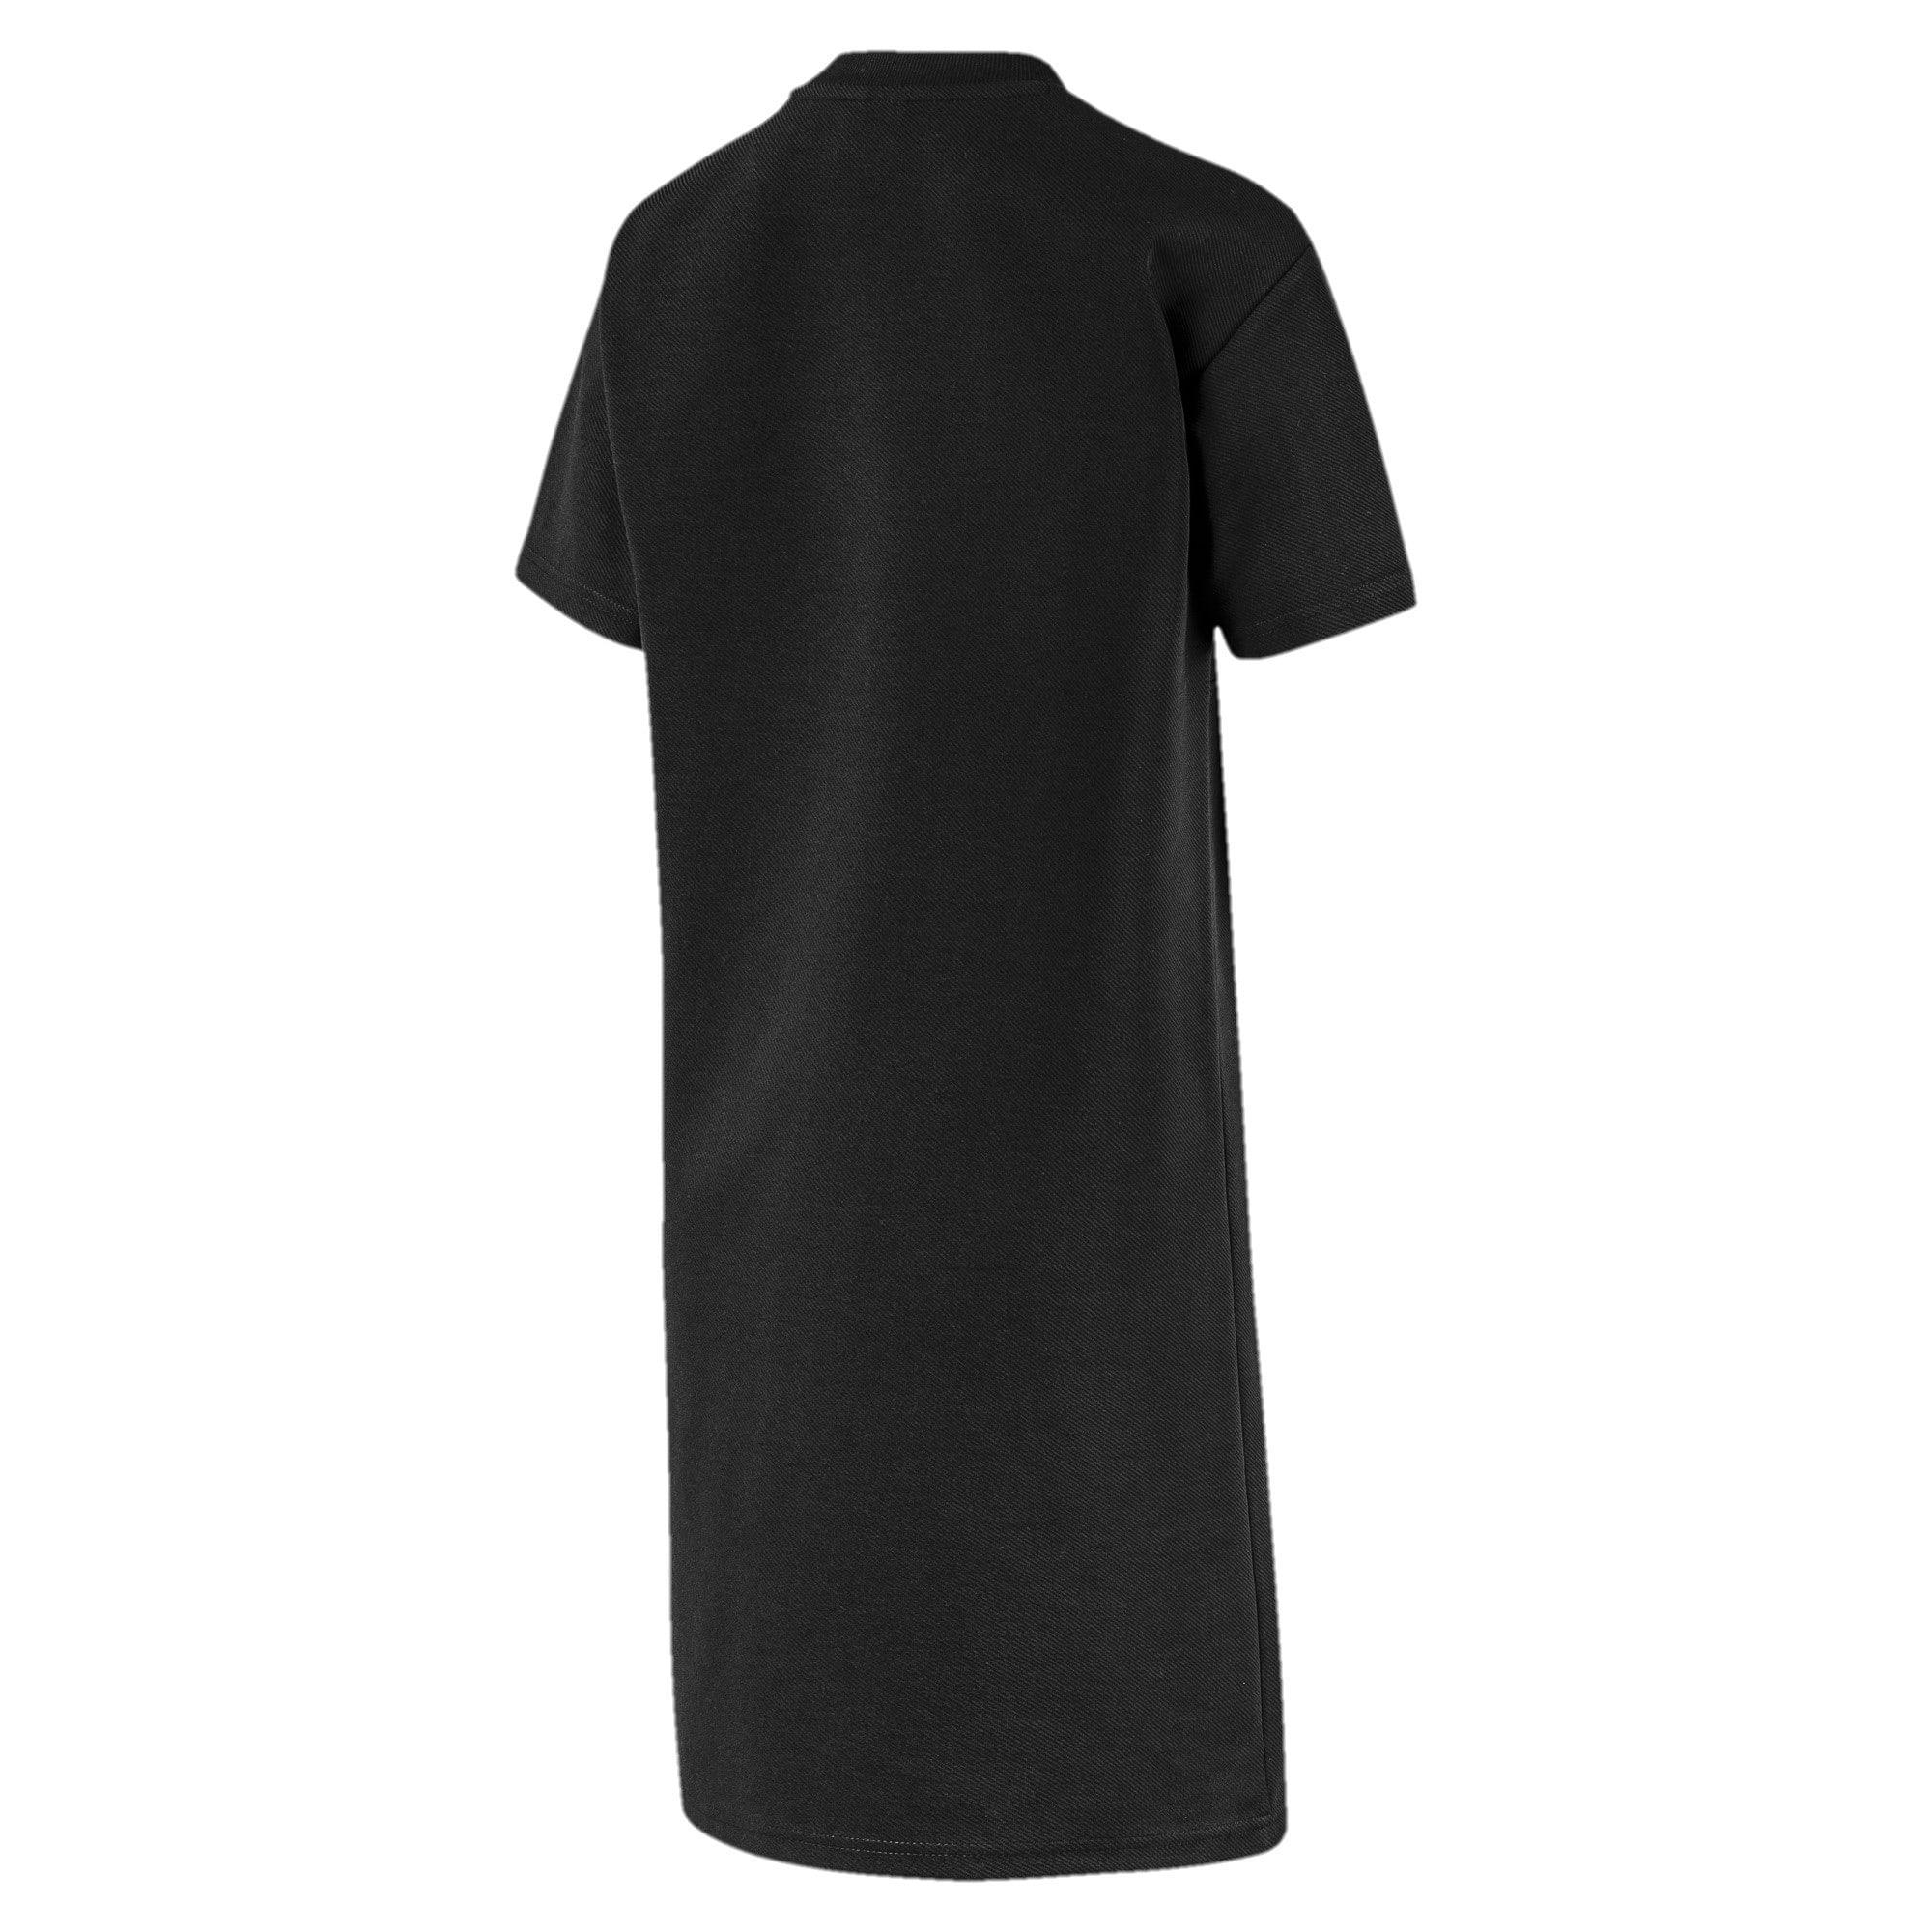 Miniatura 5 de Vestido Downtown para mujer, Puma Black, mediano